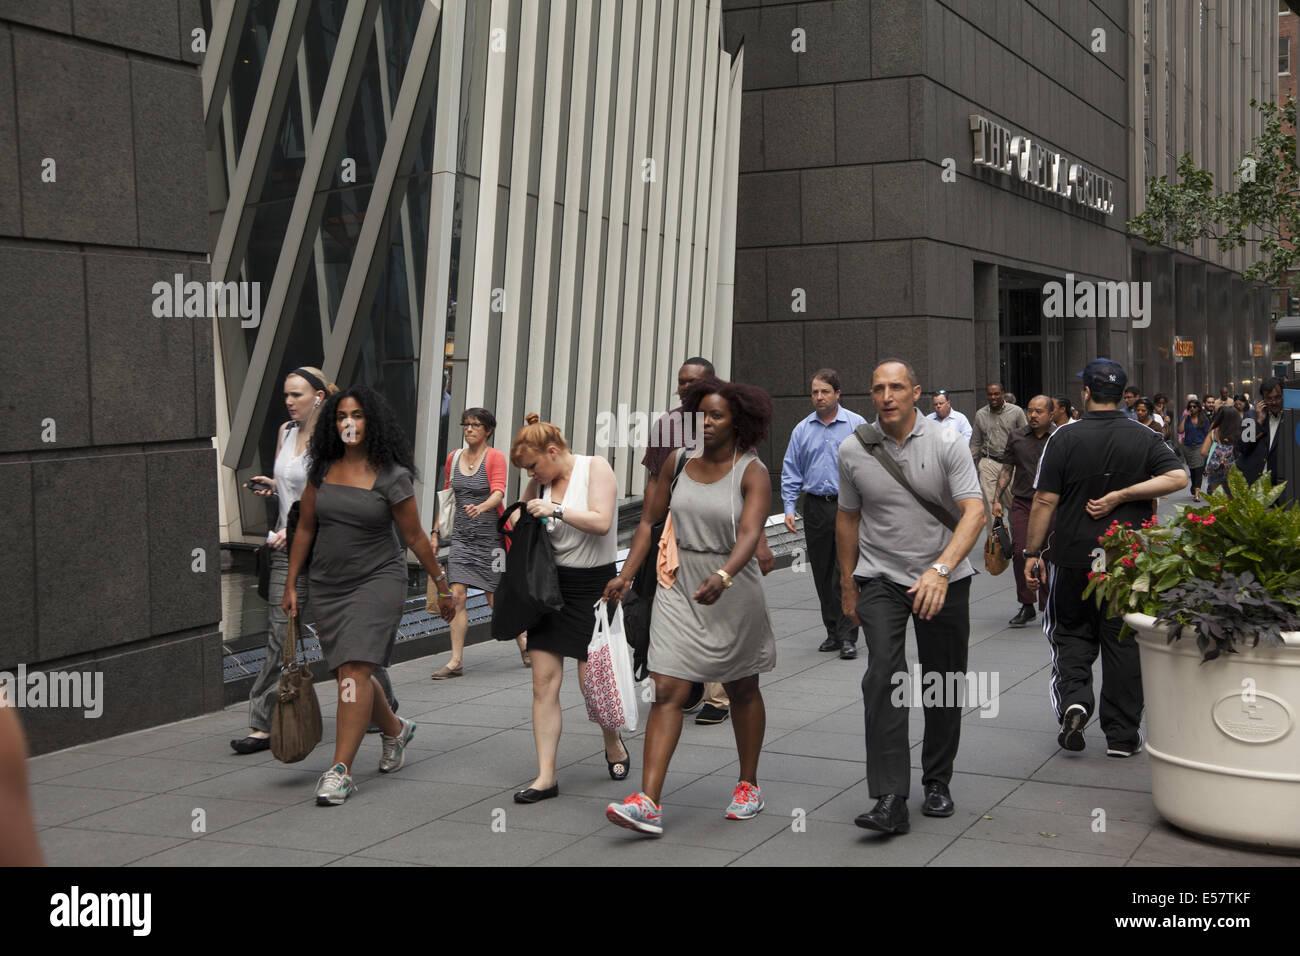 Sidewalk along E. 42nd St. in Manhattan, NYC. - Stock Image